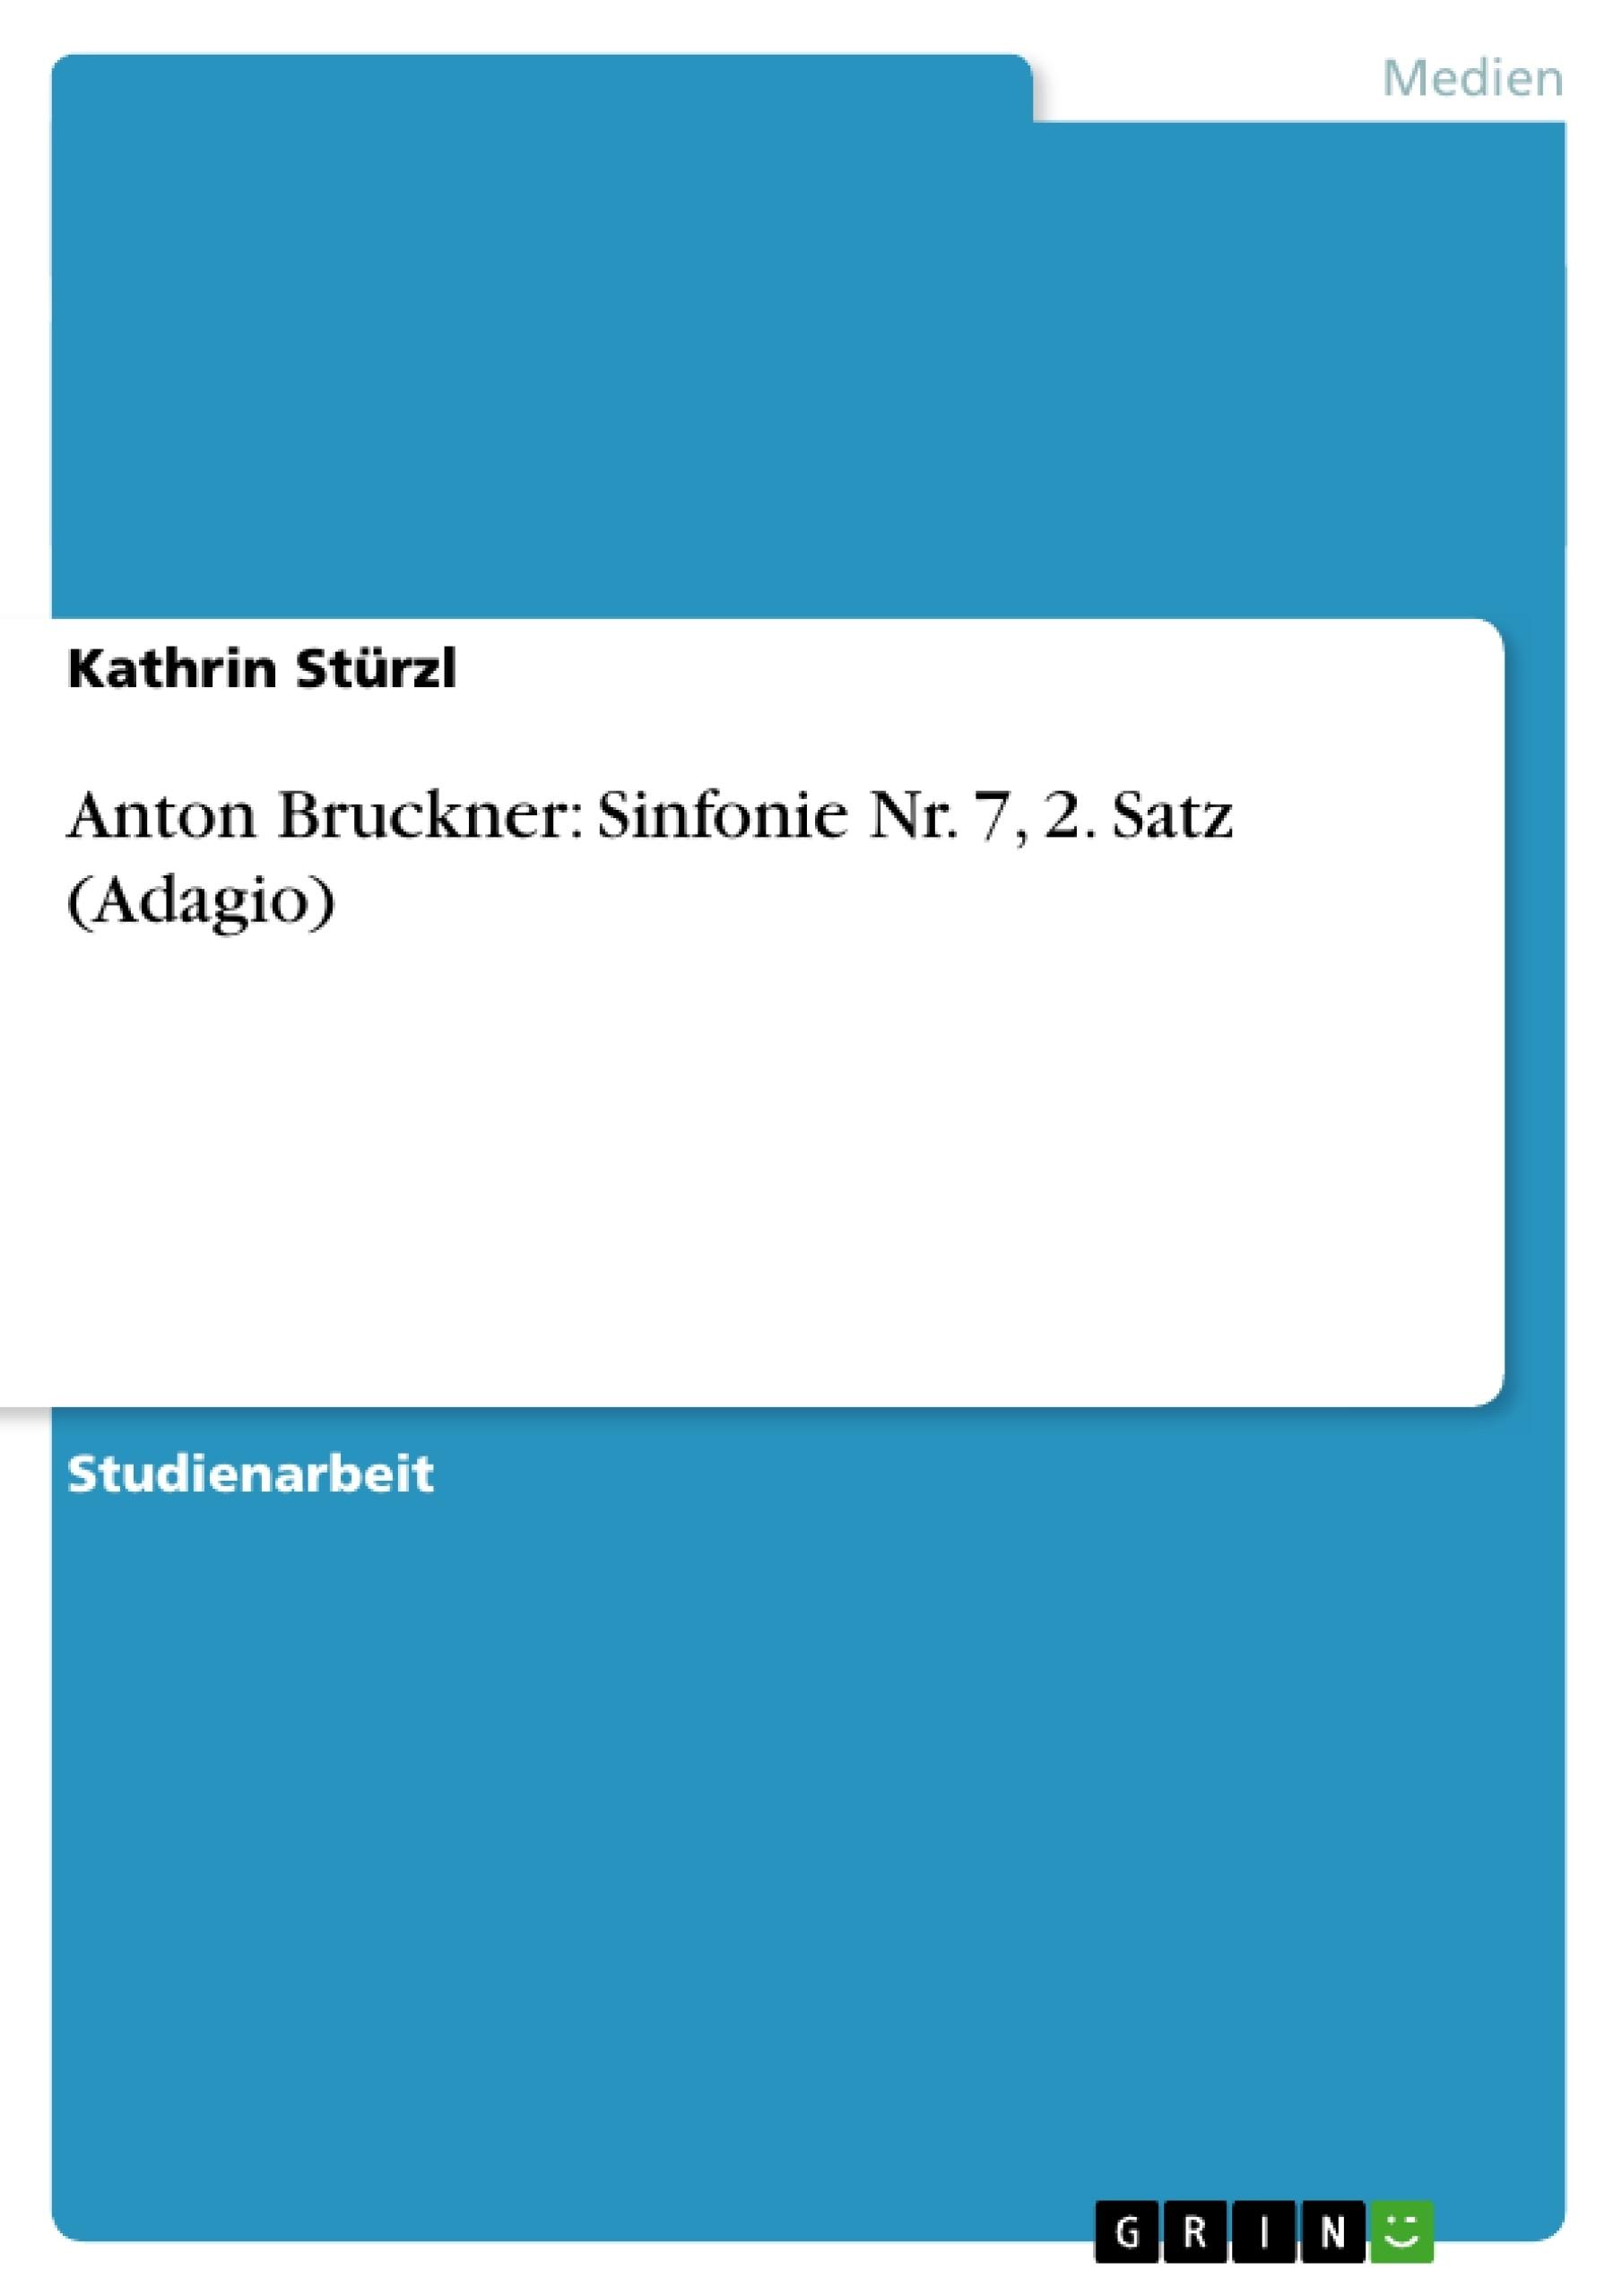 Titel: Anton Bruckner: Sinfonie Nr. 7, 2. Satz (Adagio)